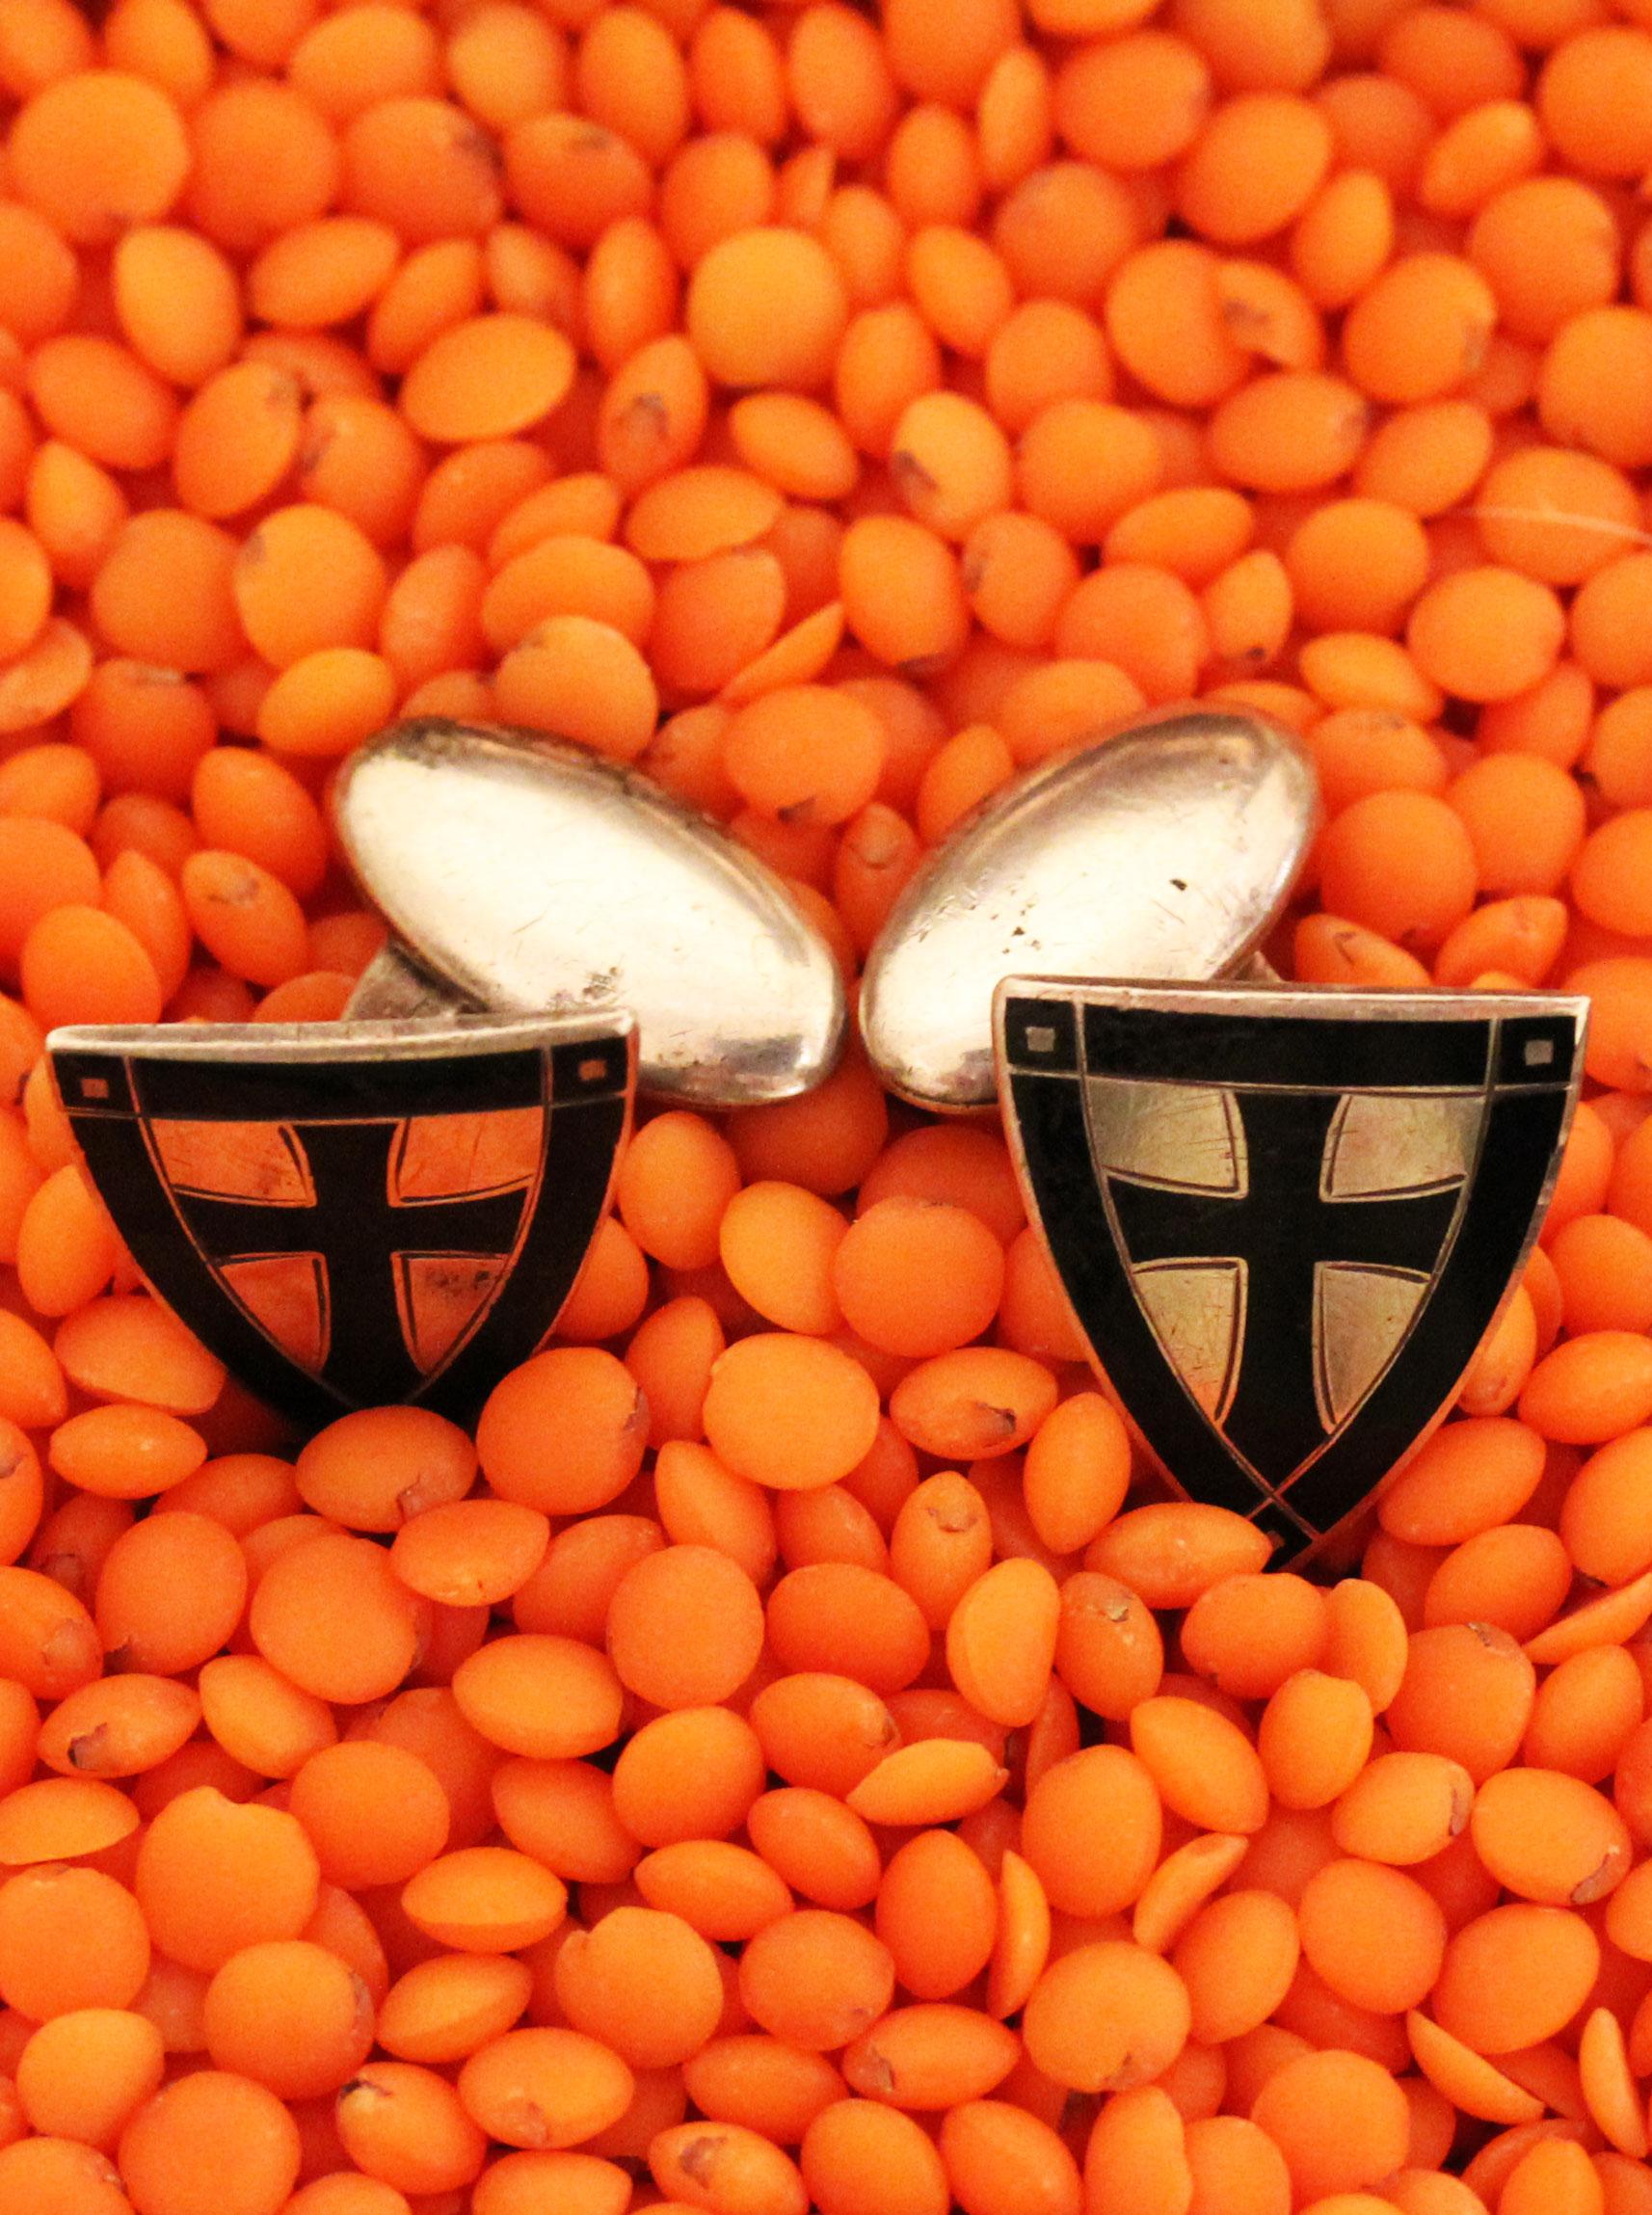 Cufflinks with a knight shield